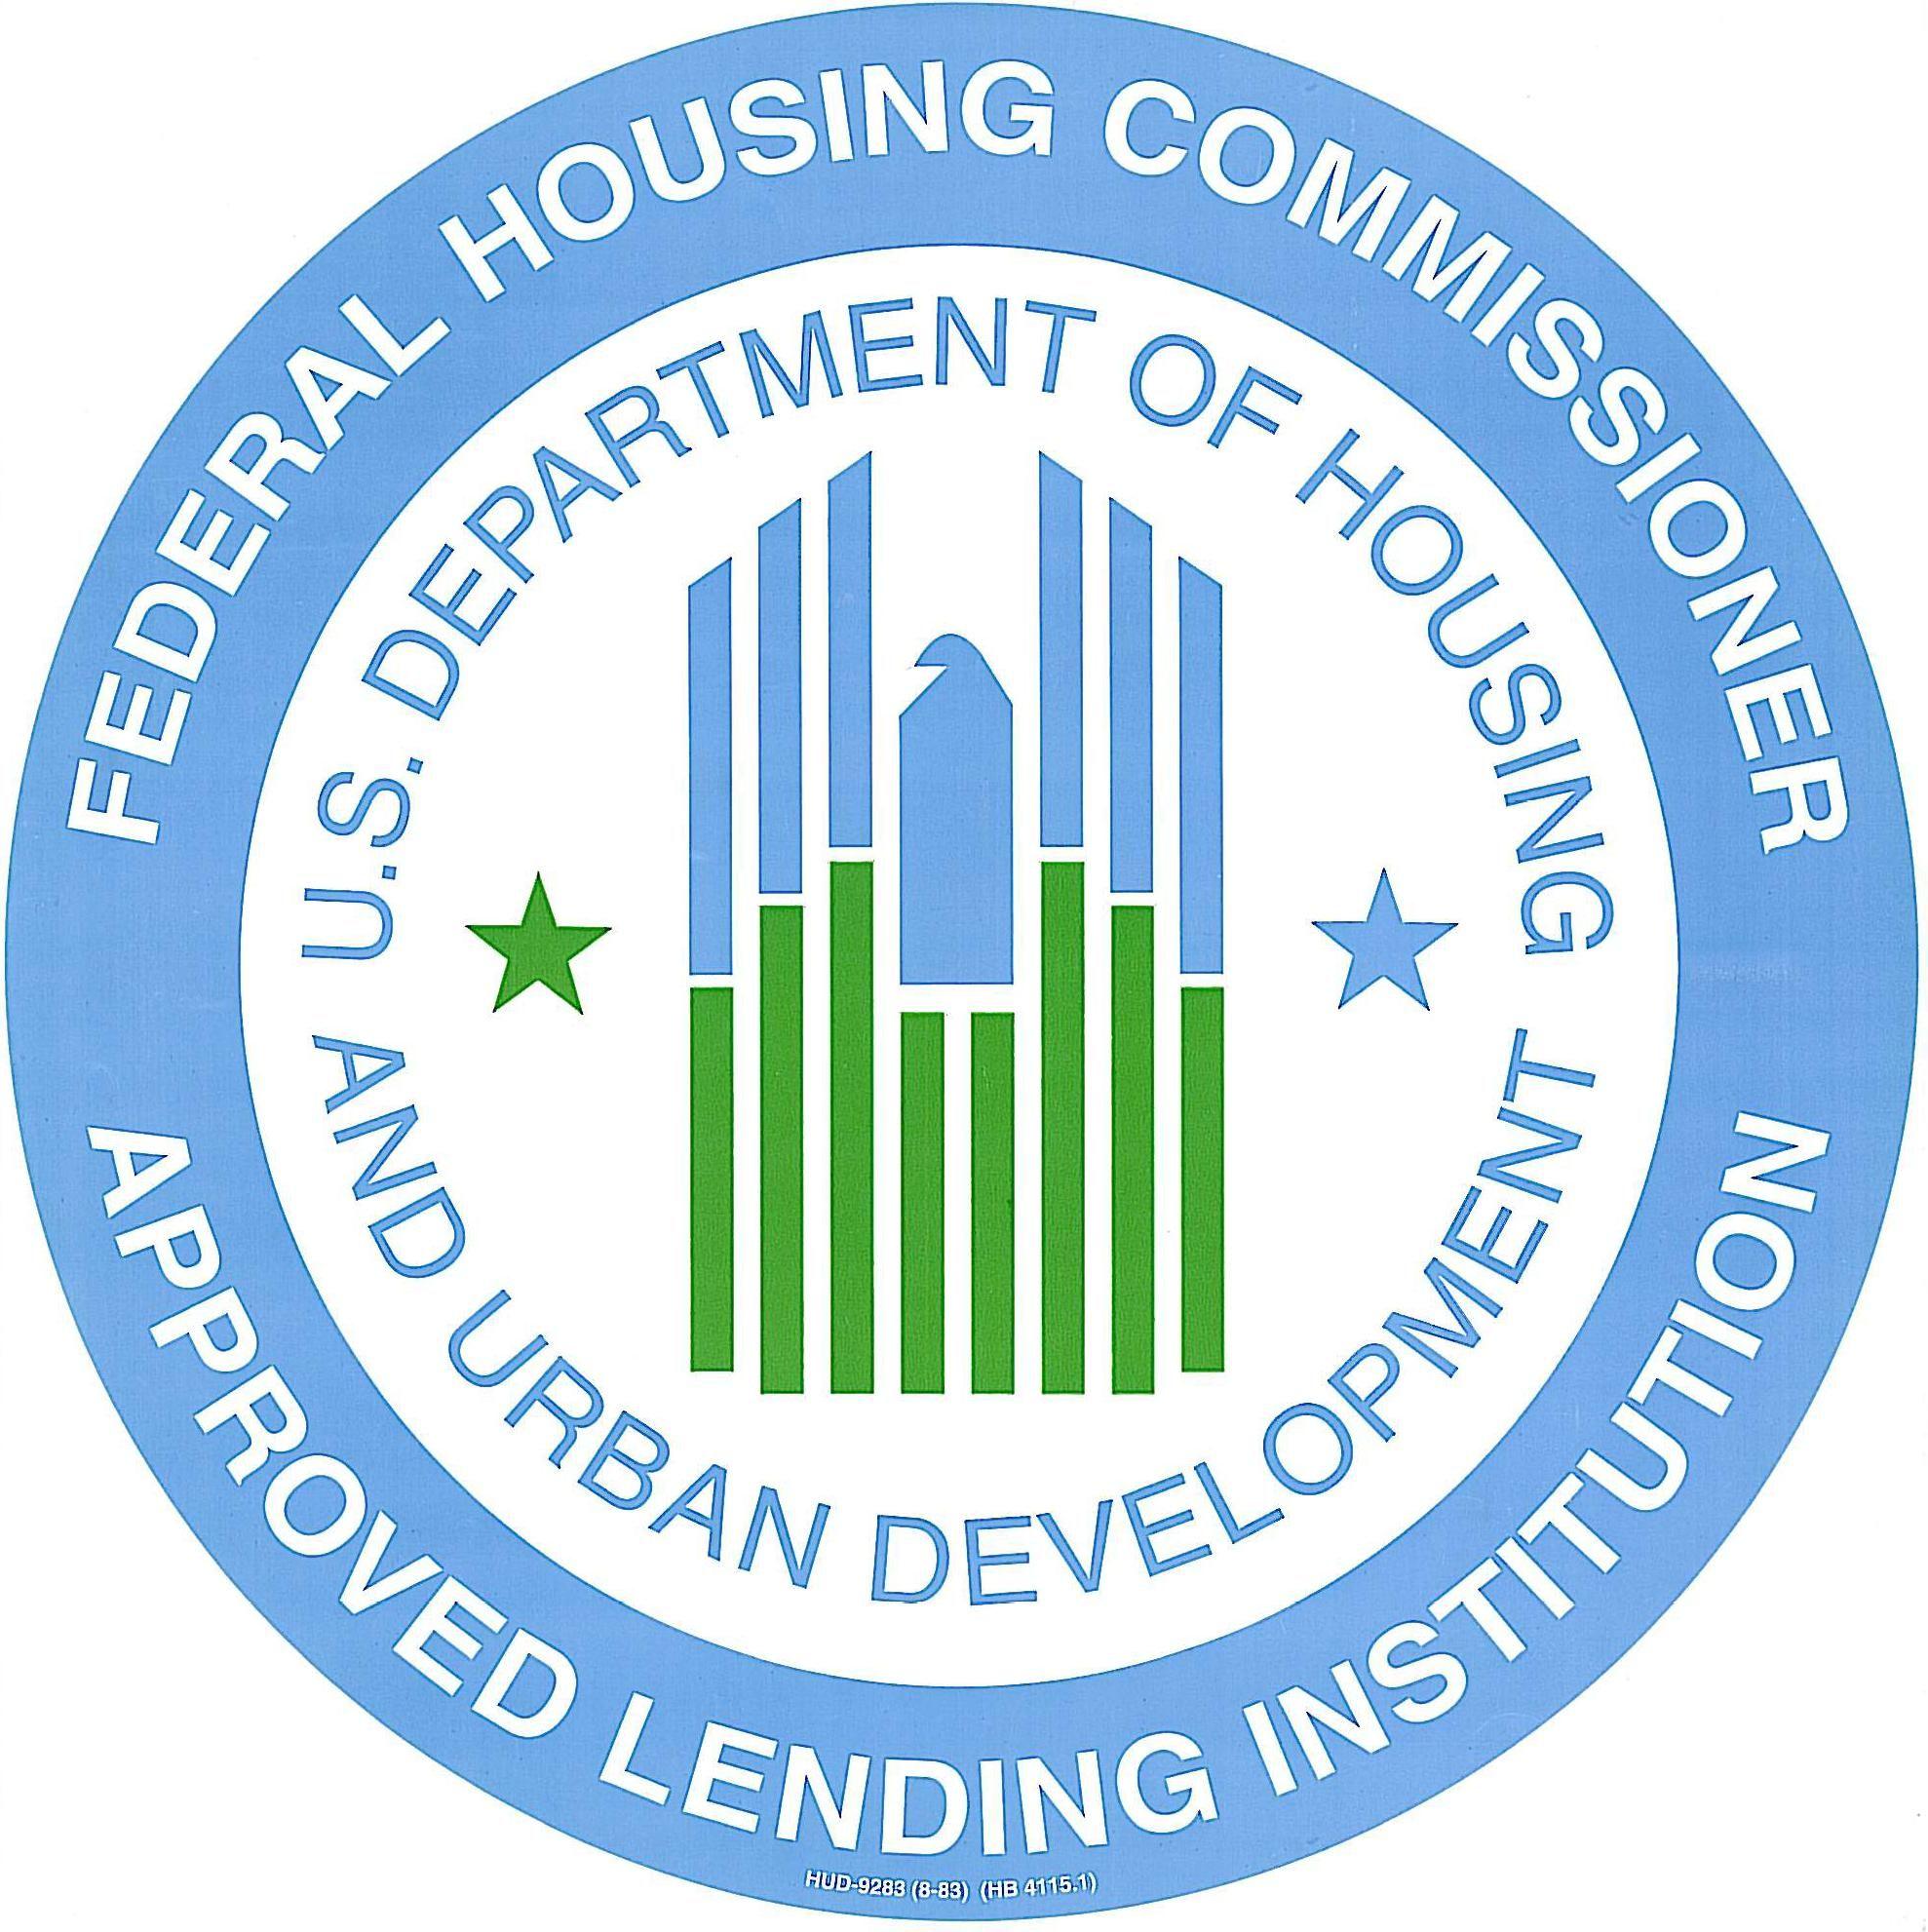 City Of Phoenix Housing Department In Arizona City Department Arizona